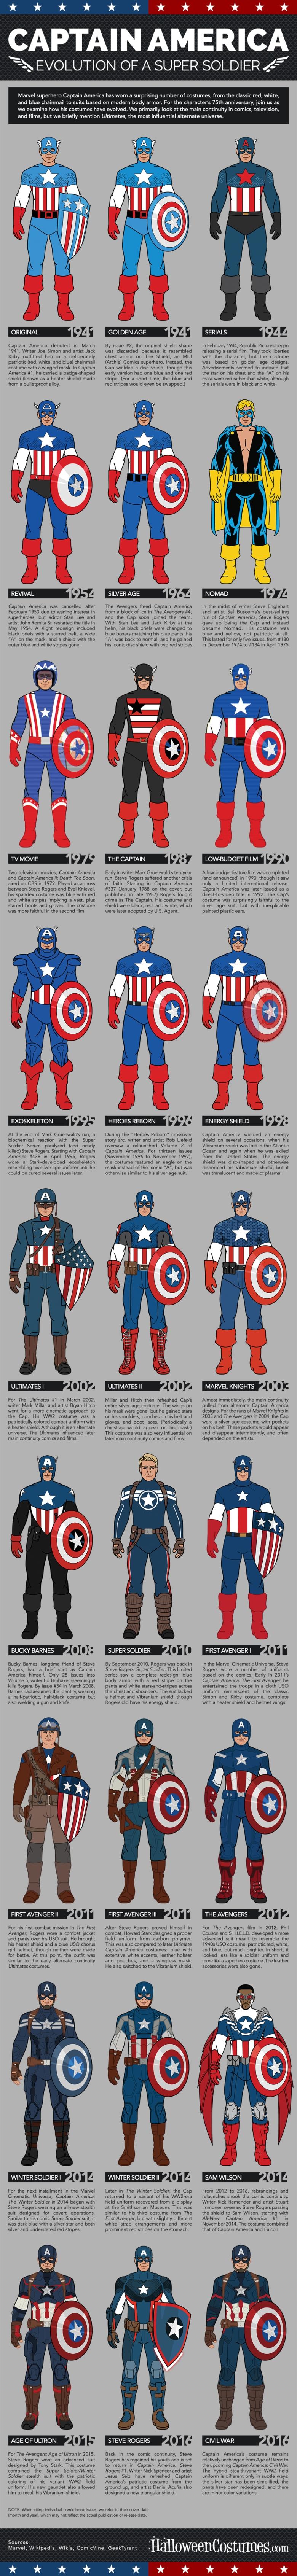 Captain-America-Costumes-Infographic